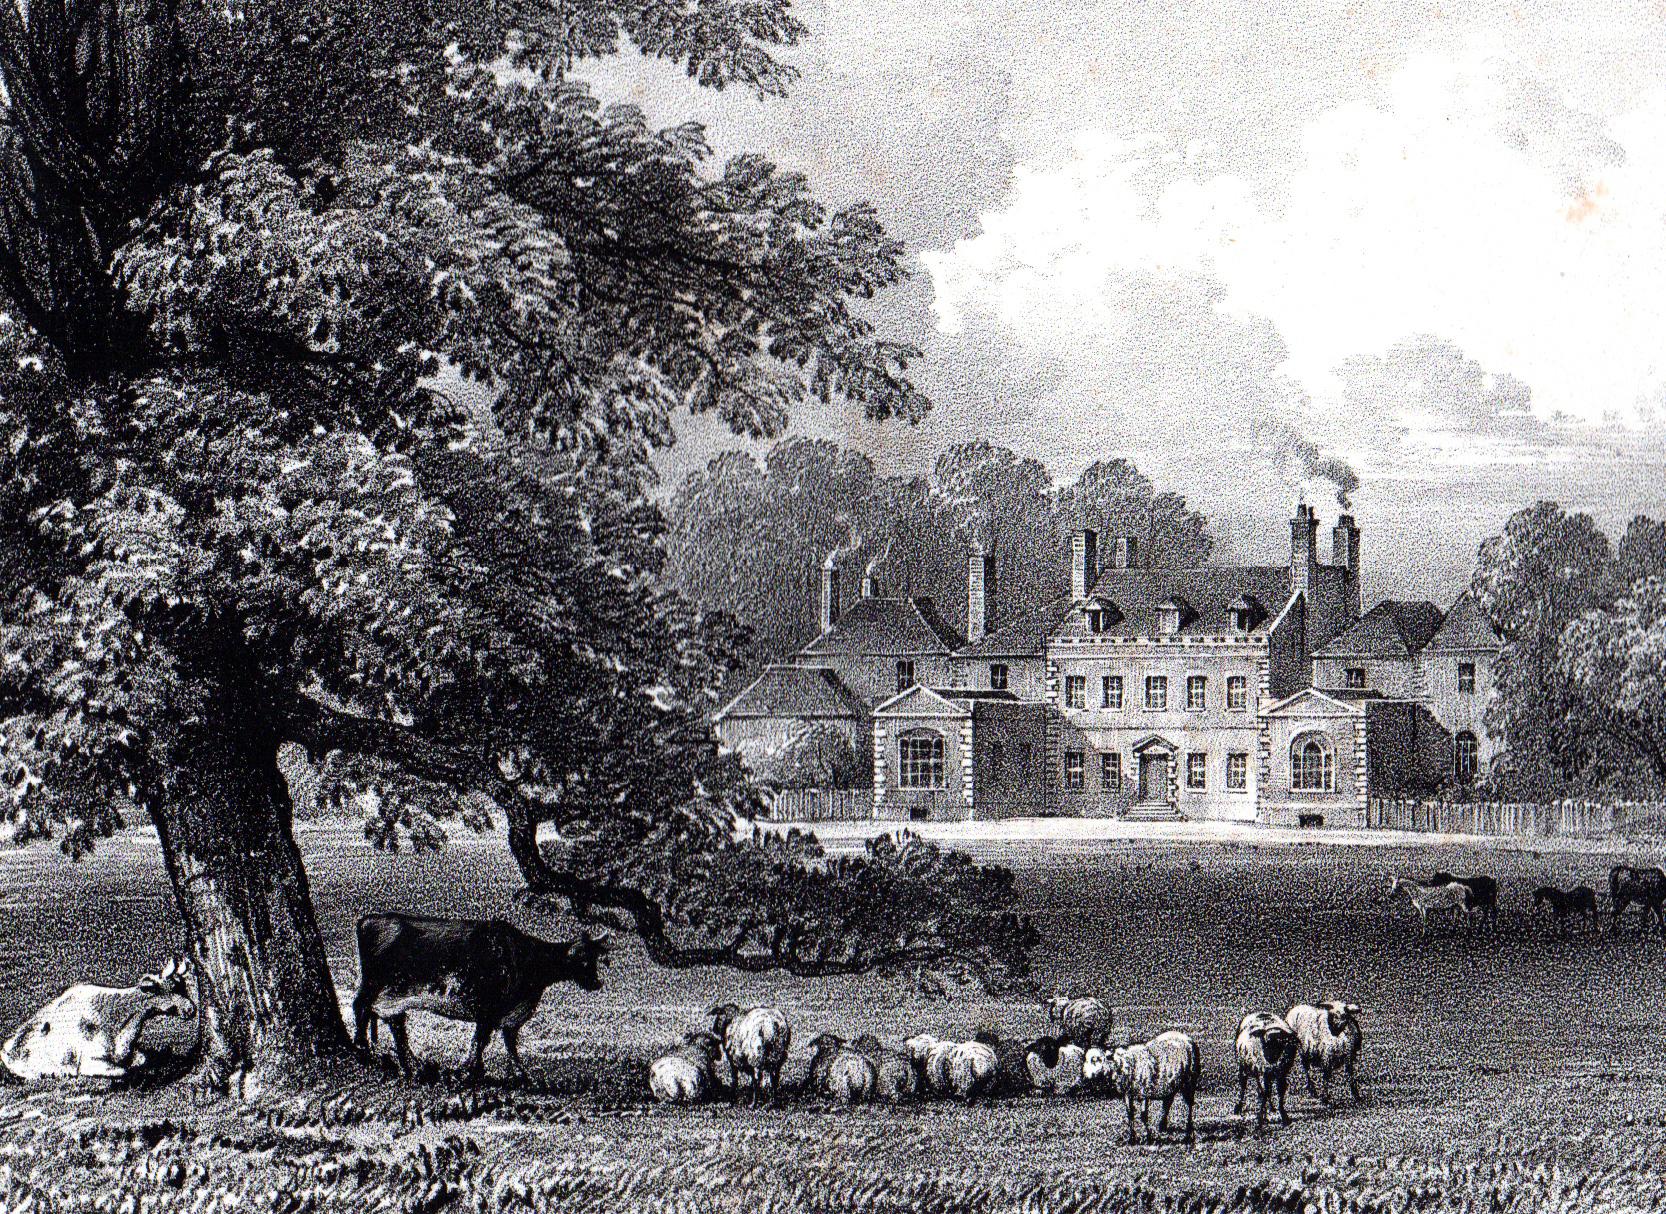 Miscellaneous antique prints of Great Britain